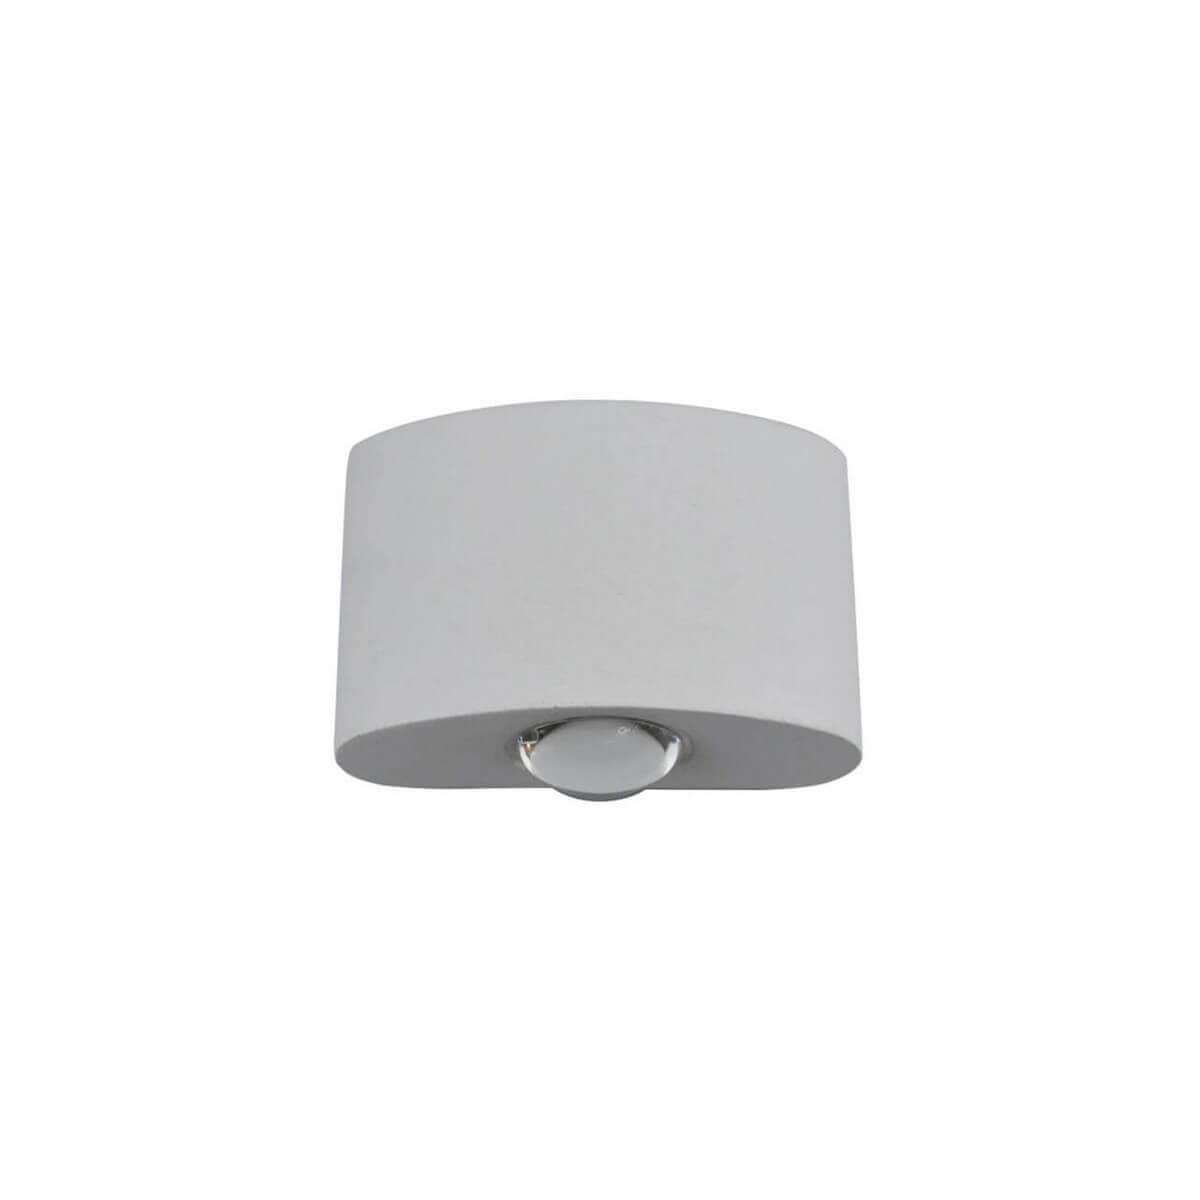 Светильник Kink Light 08571,01 Ореон